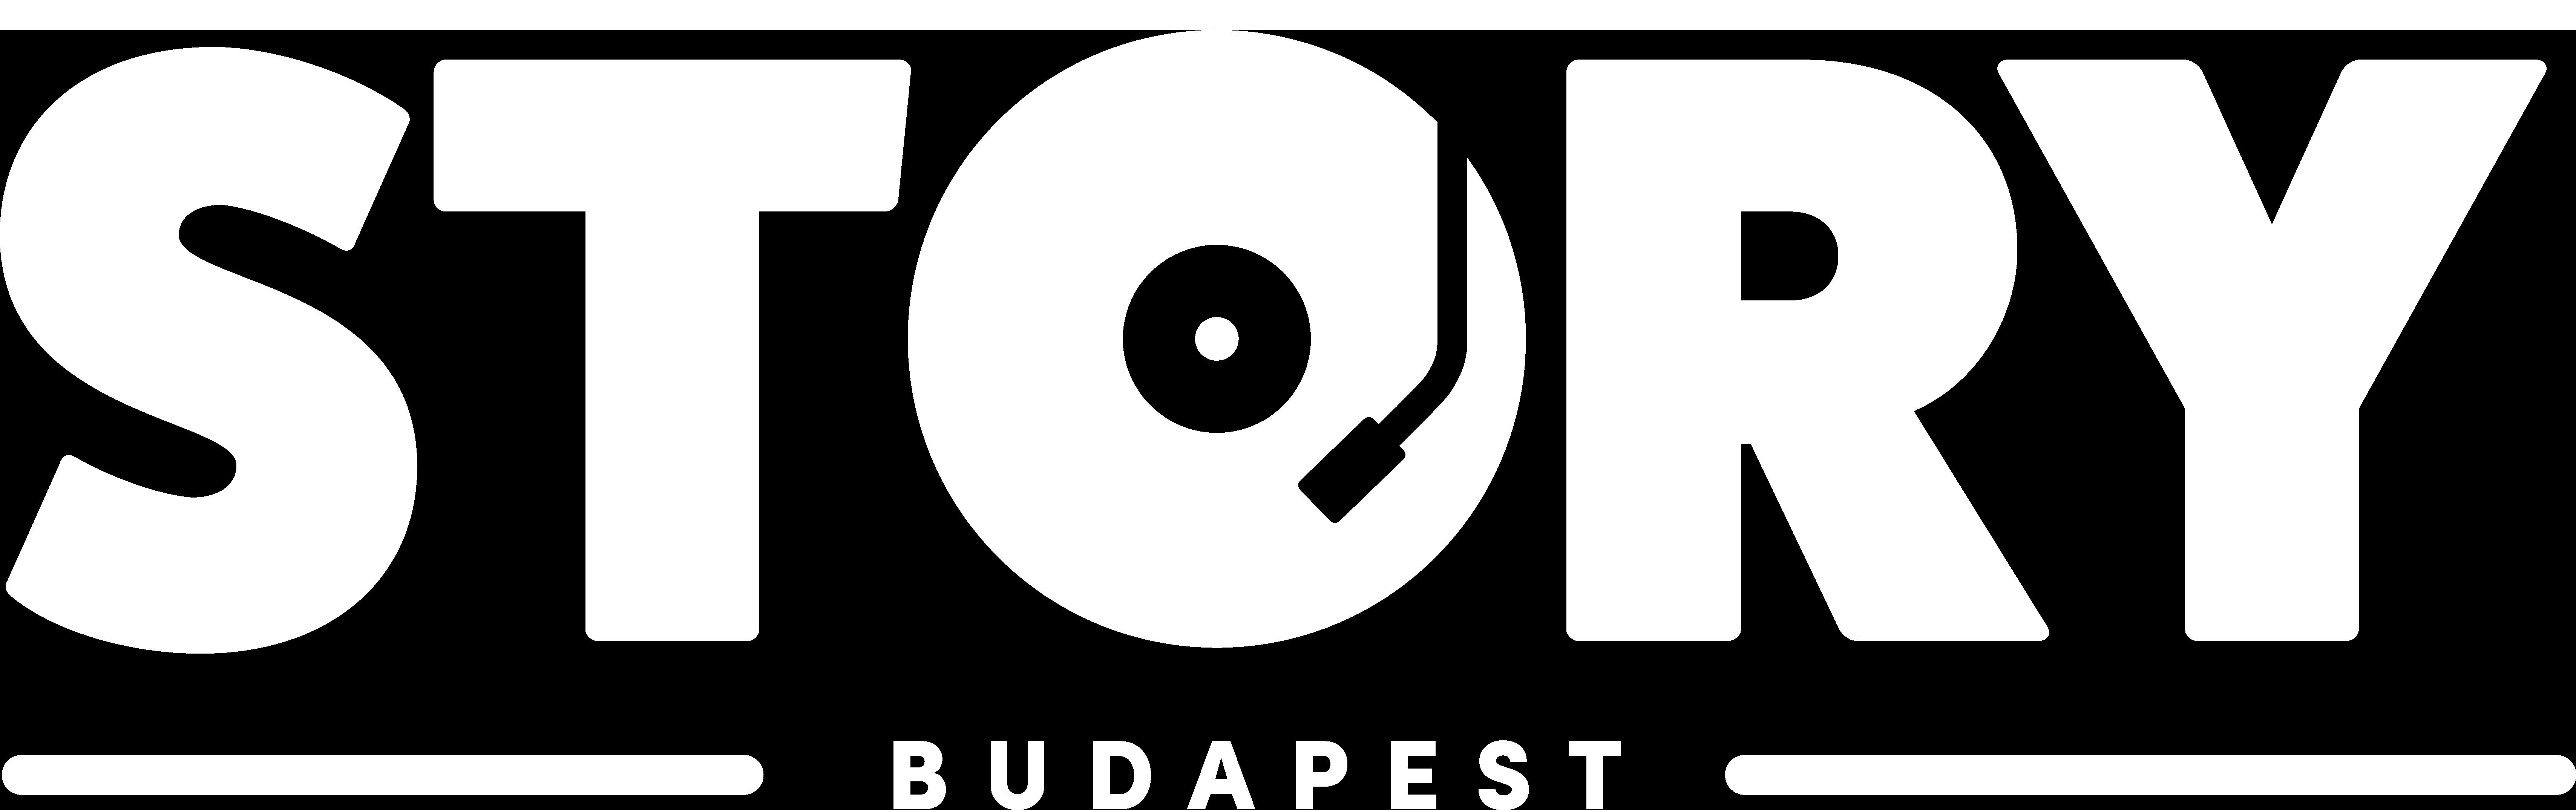 Story Budapest.